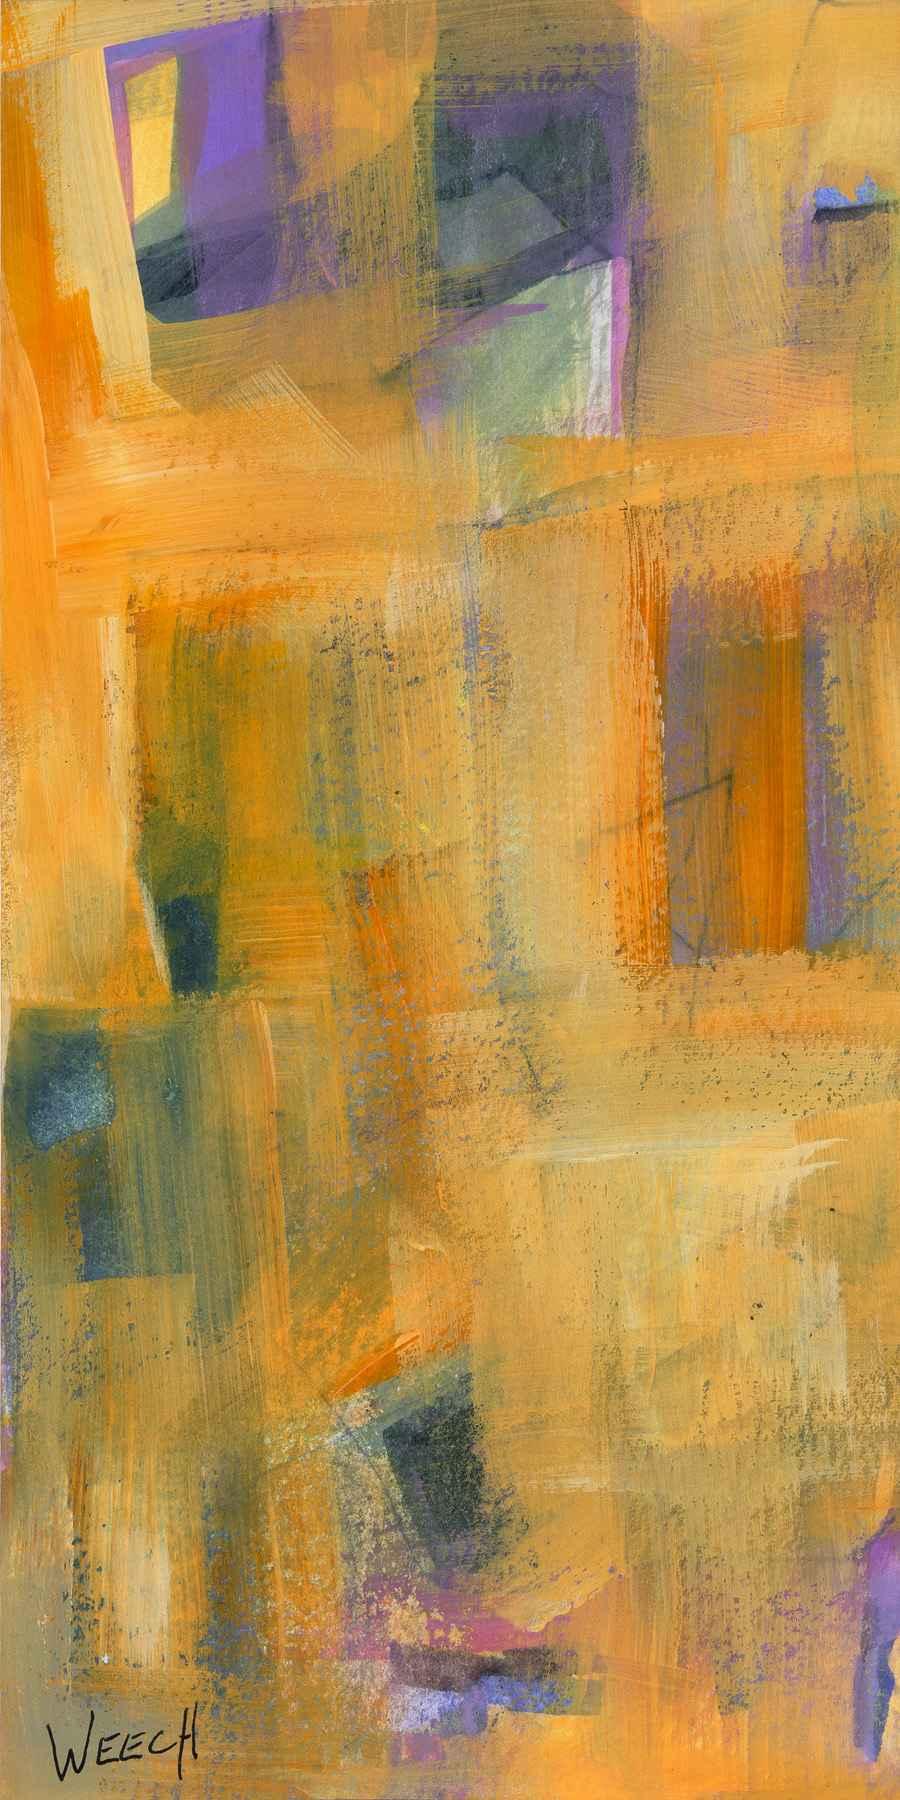 City Rhythm I by  Paula Weech - Masterpiece Online